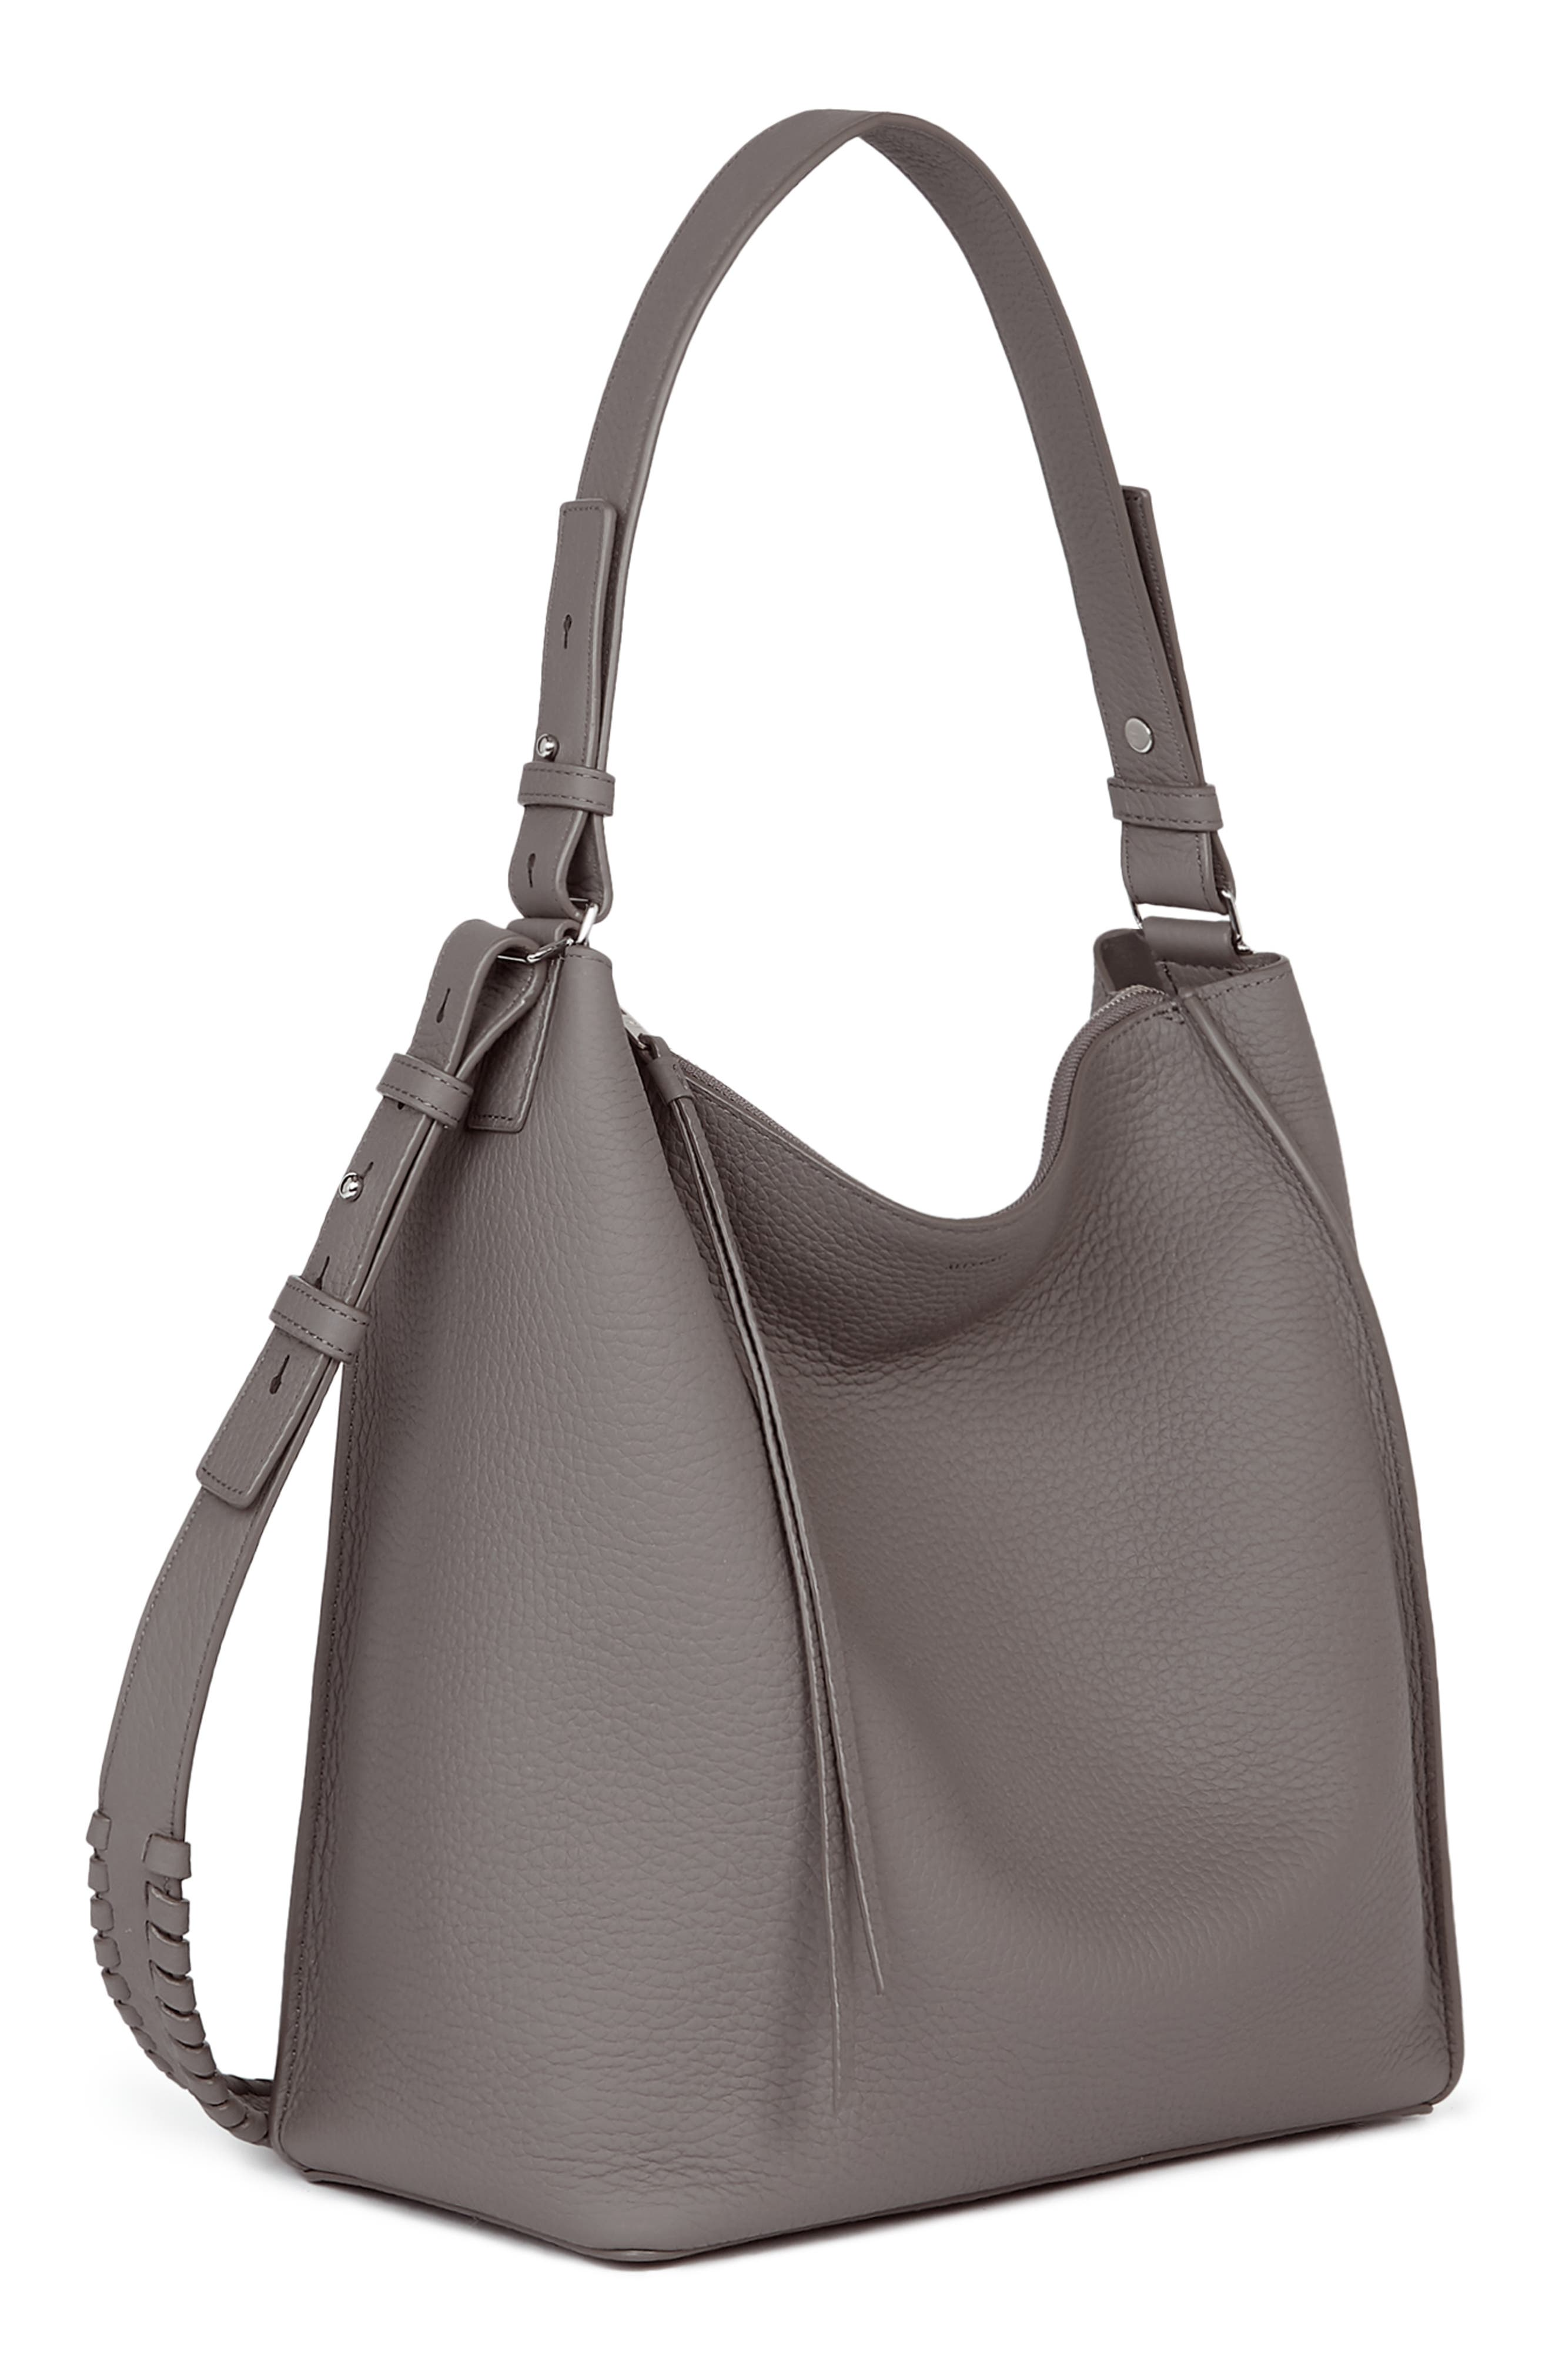 ALLSAINTS, 'Kita' Leather Shoulder/Crossbody Bag, Alternate thumbnail 6, color, STORM GREY